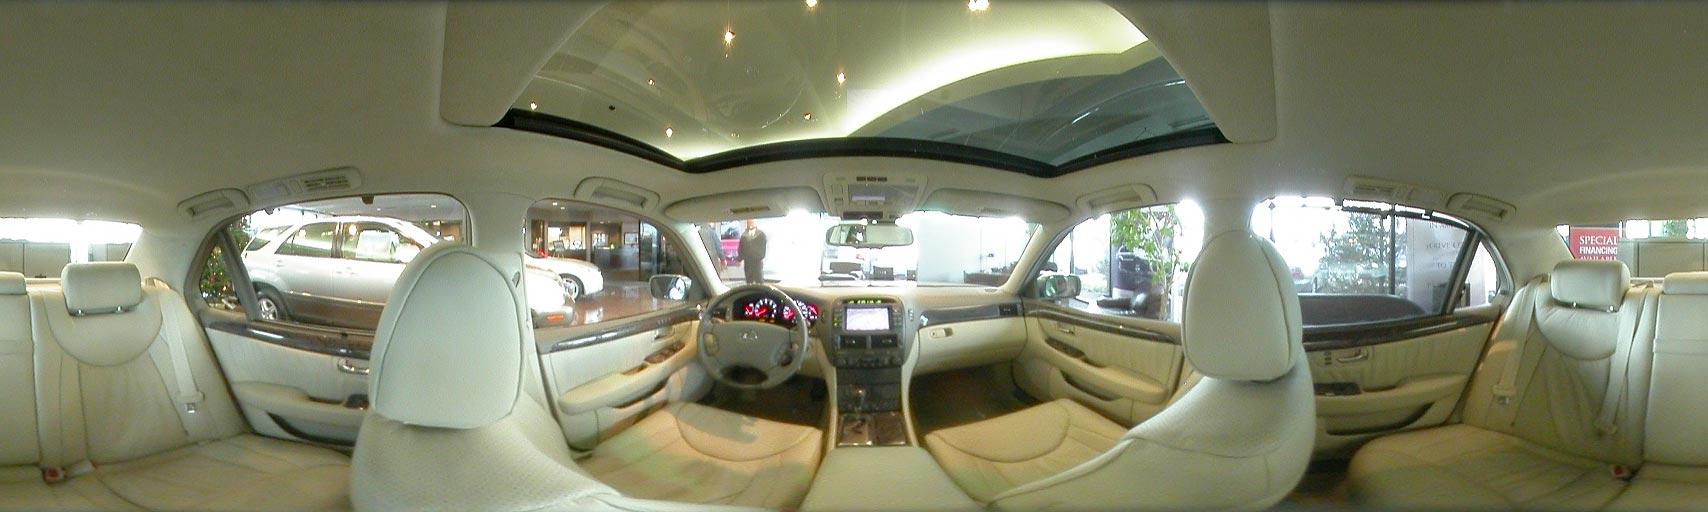 car interior 360 degree view. Black Bedroom Furniture Sets. Home Design Ideas